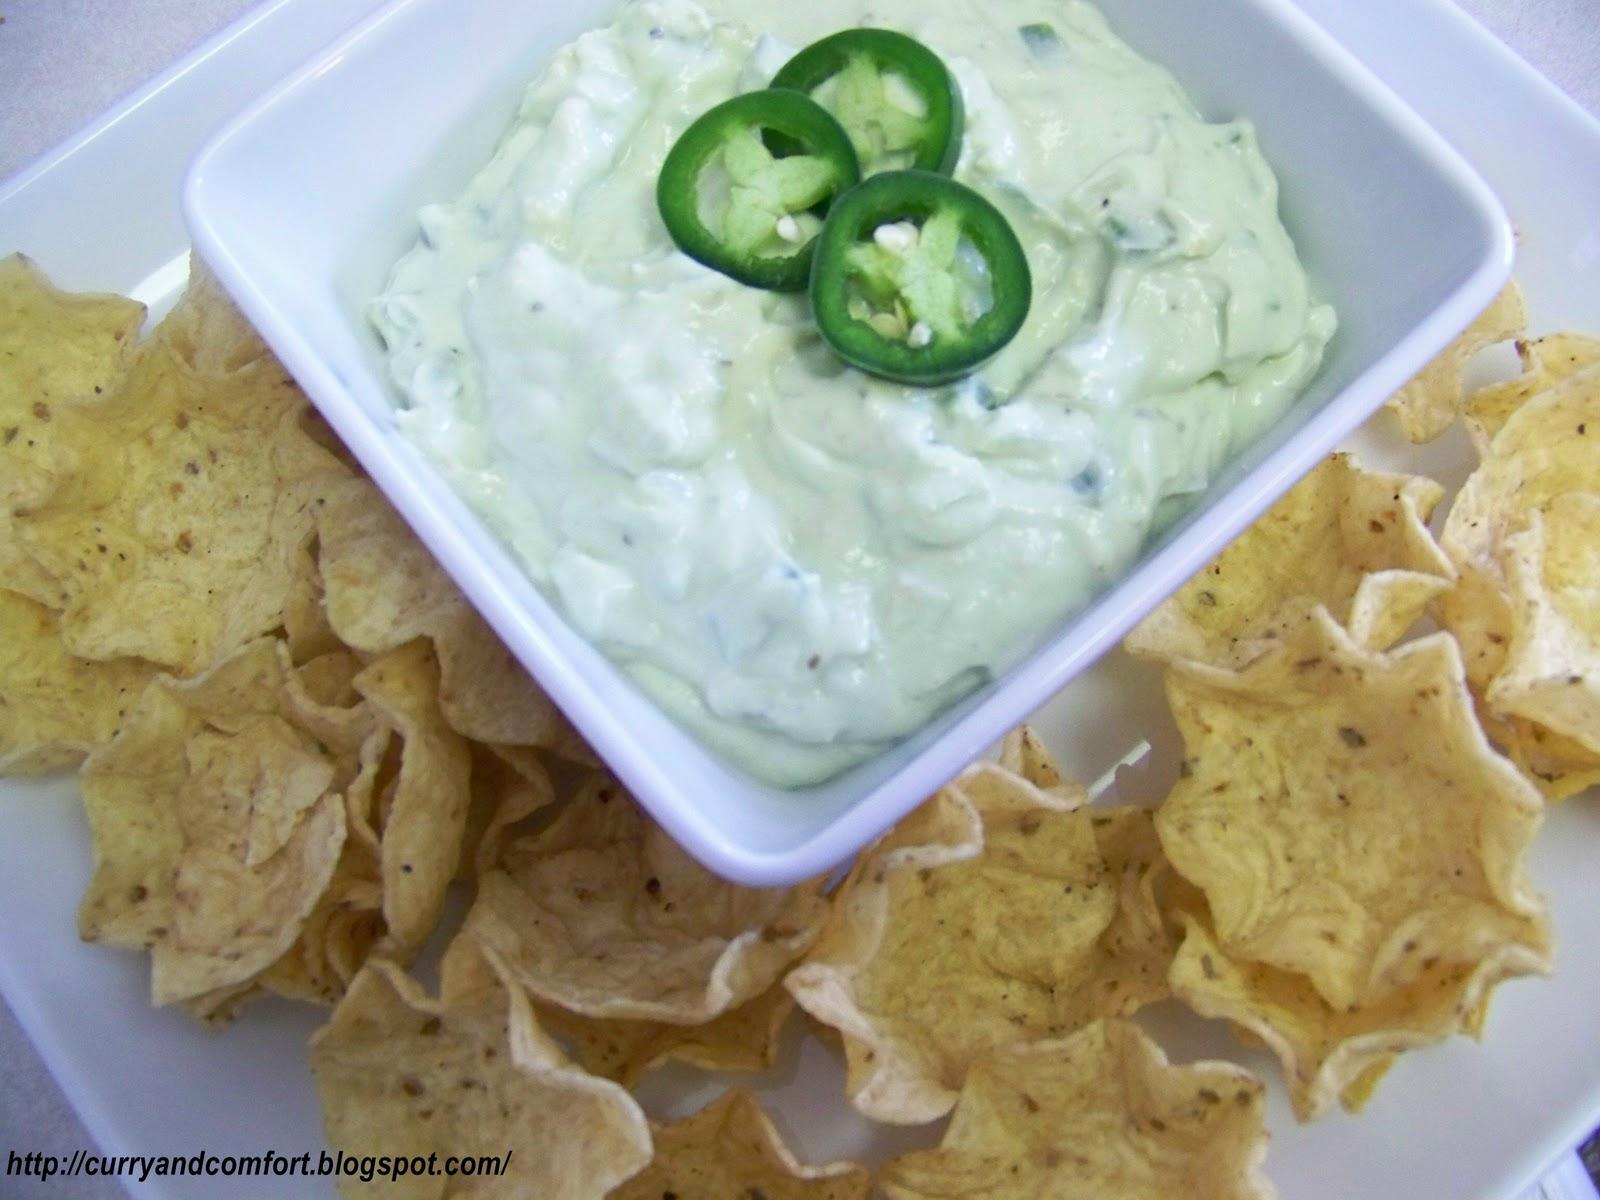 Kitchen Simmer: Creamy Guacamole Dip